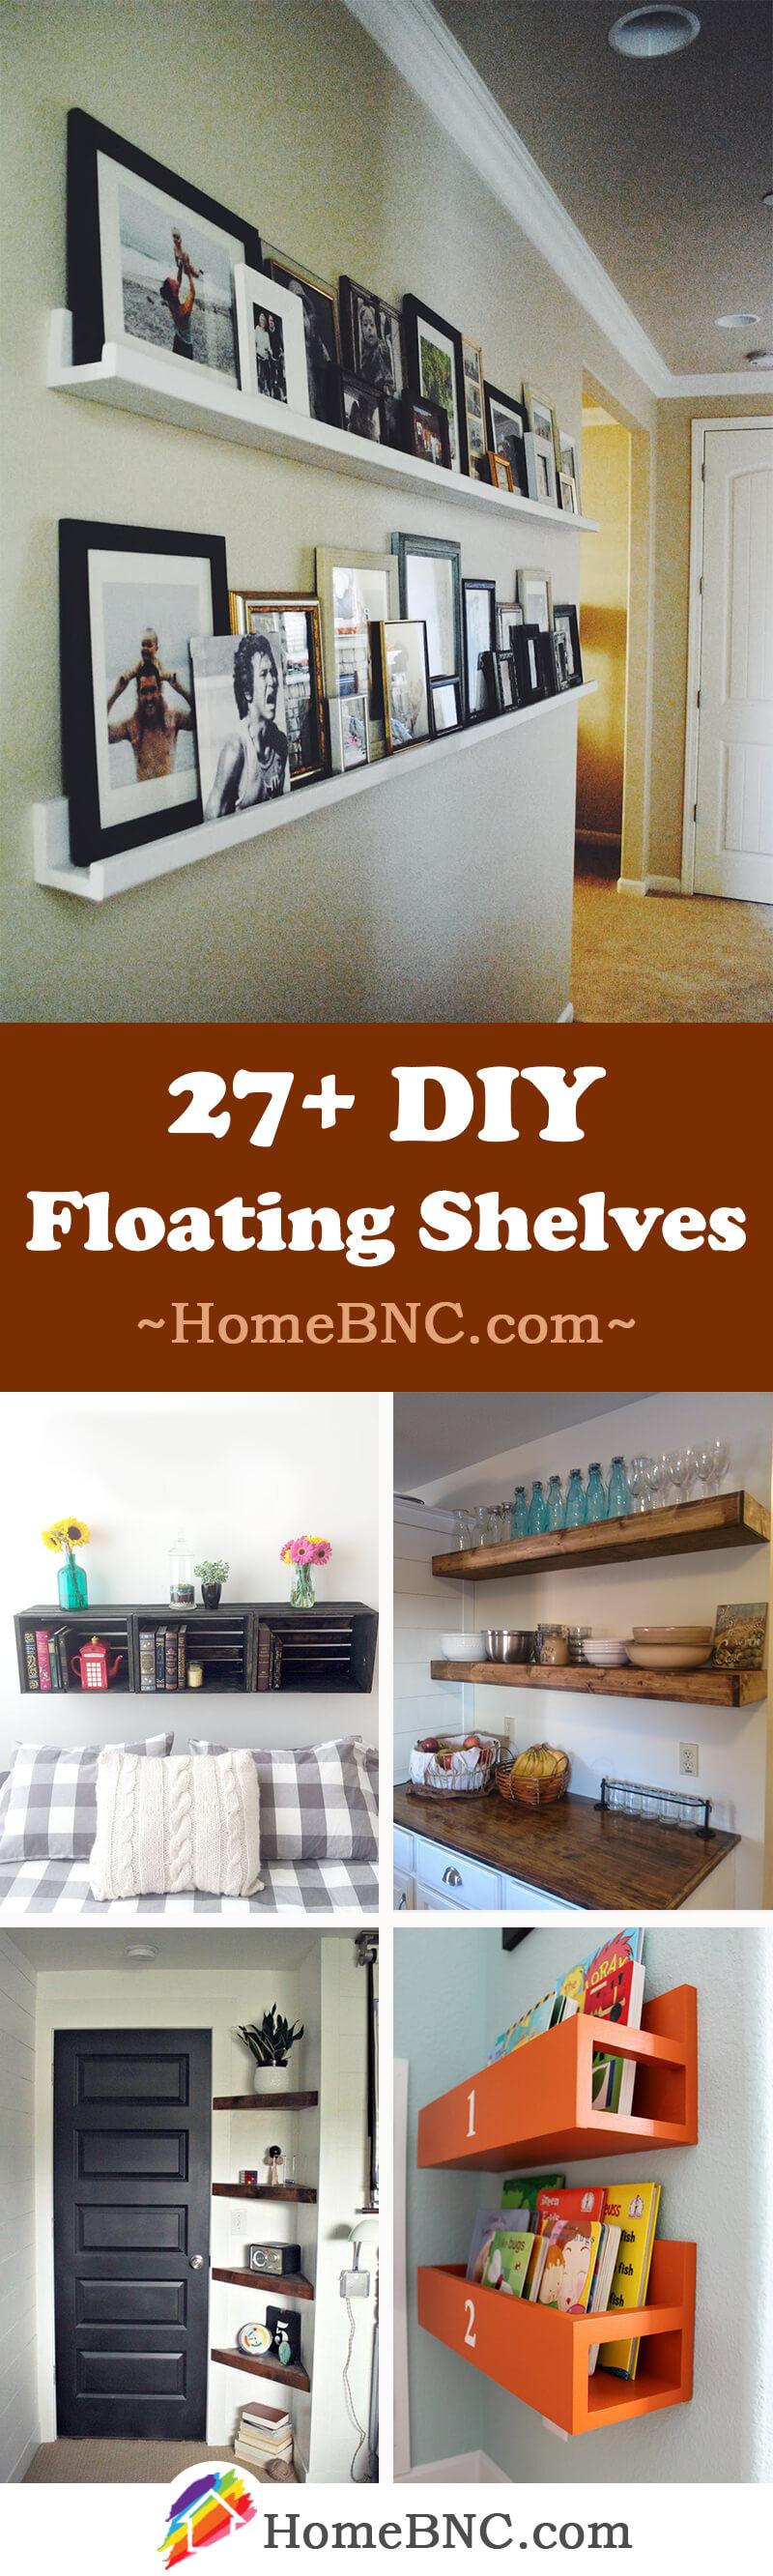 best diy floating shelf ideas and designs for share homebnc box shelves bold save space distance between closet wooden kitchen storage rack bookshelf alternatives barn wood target